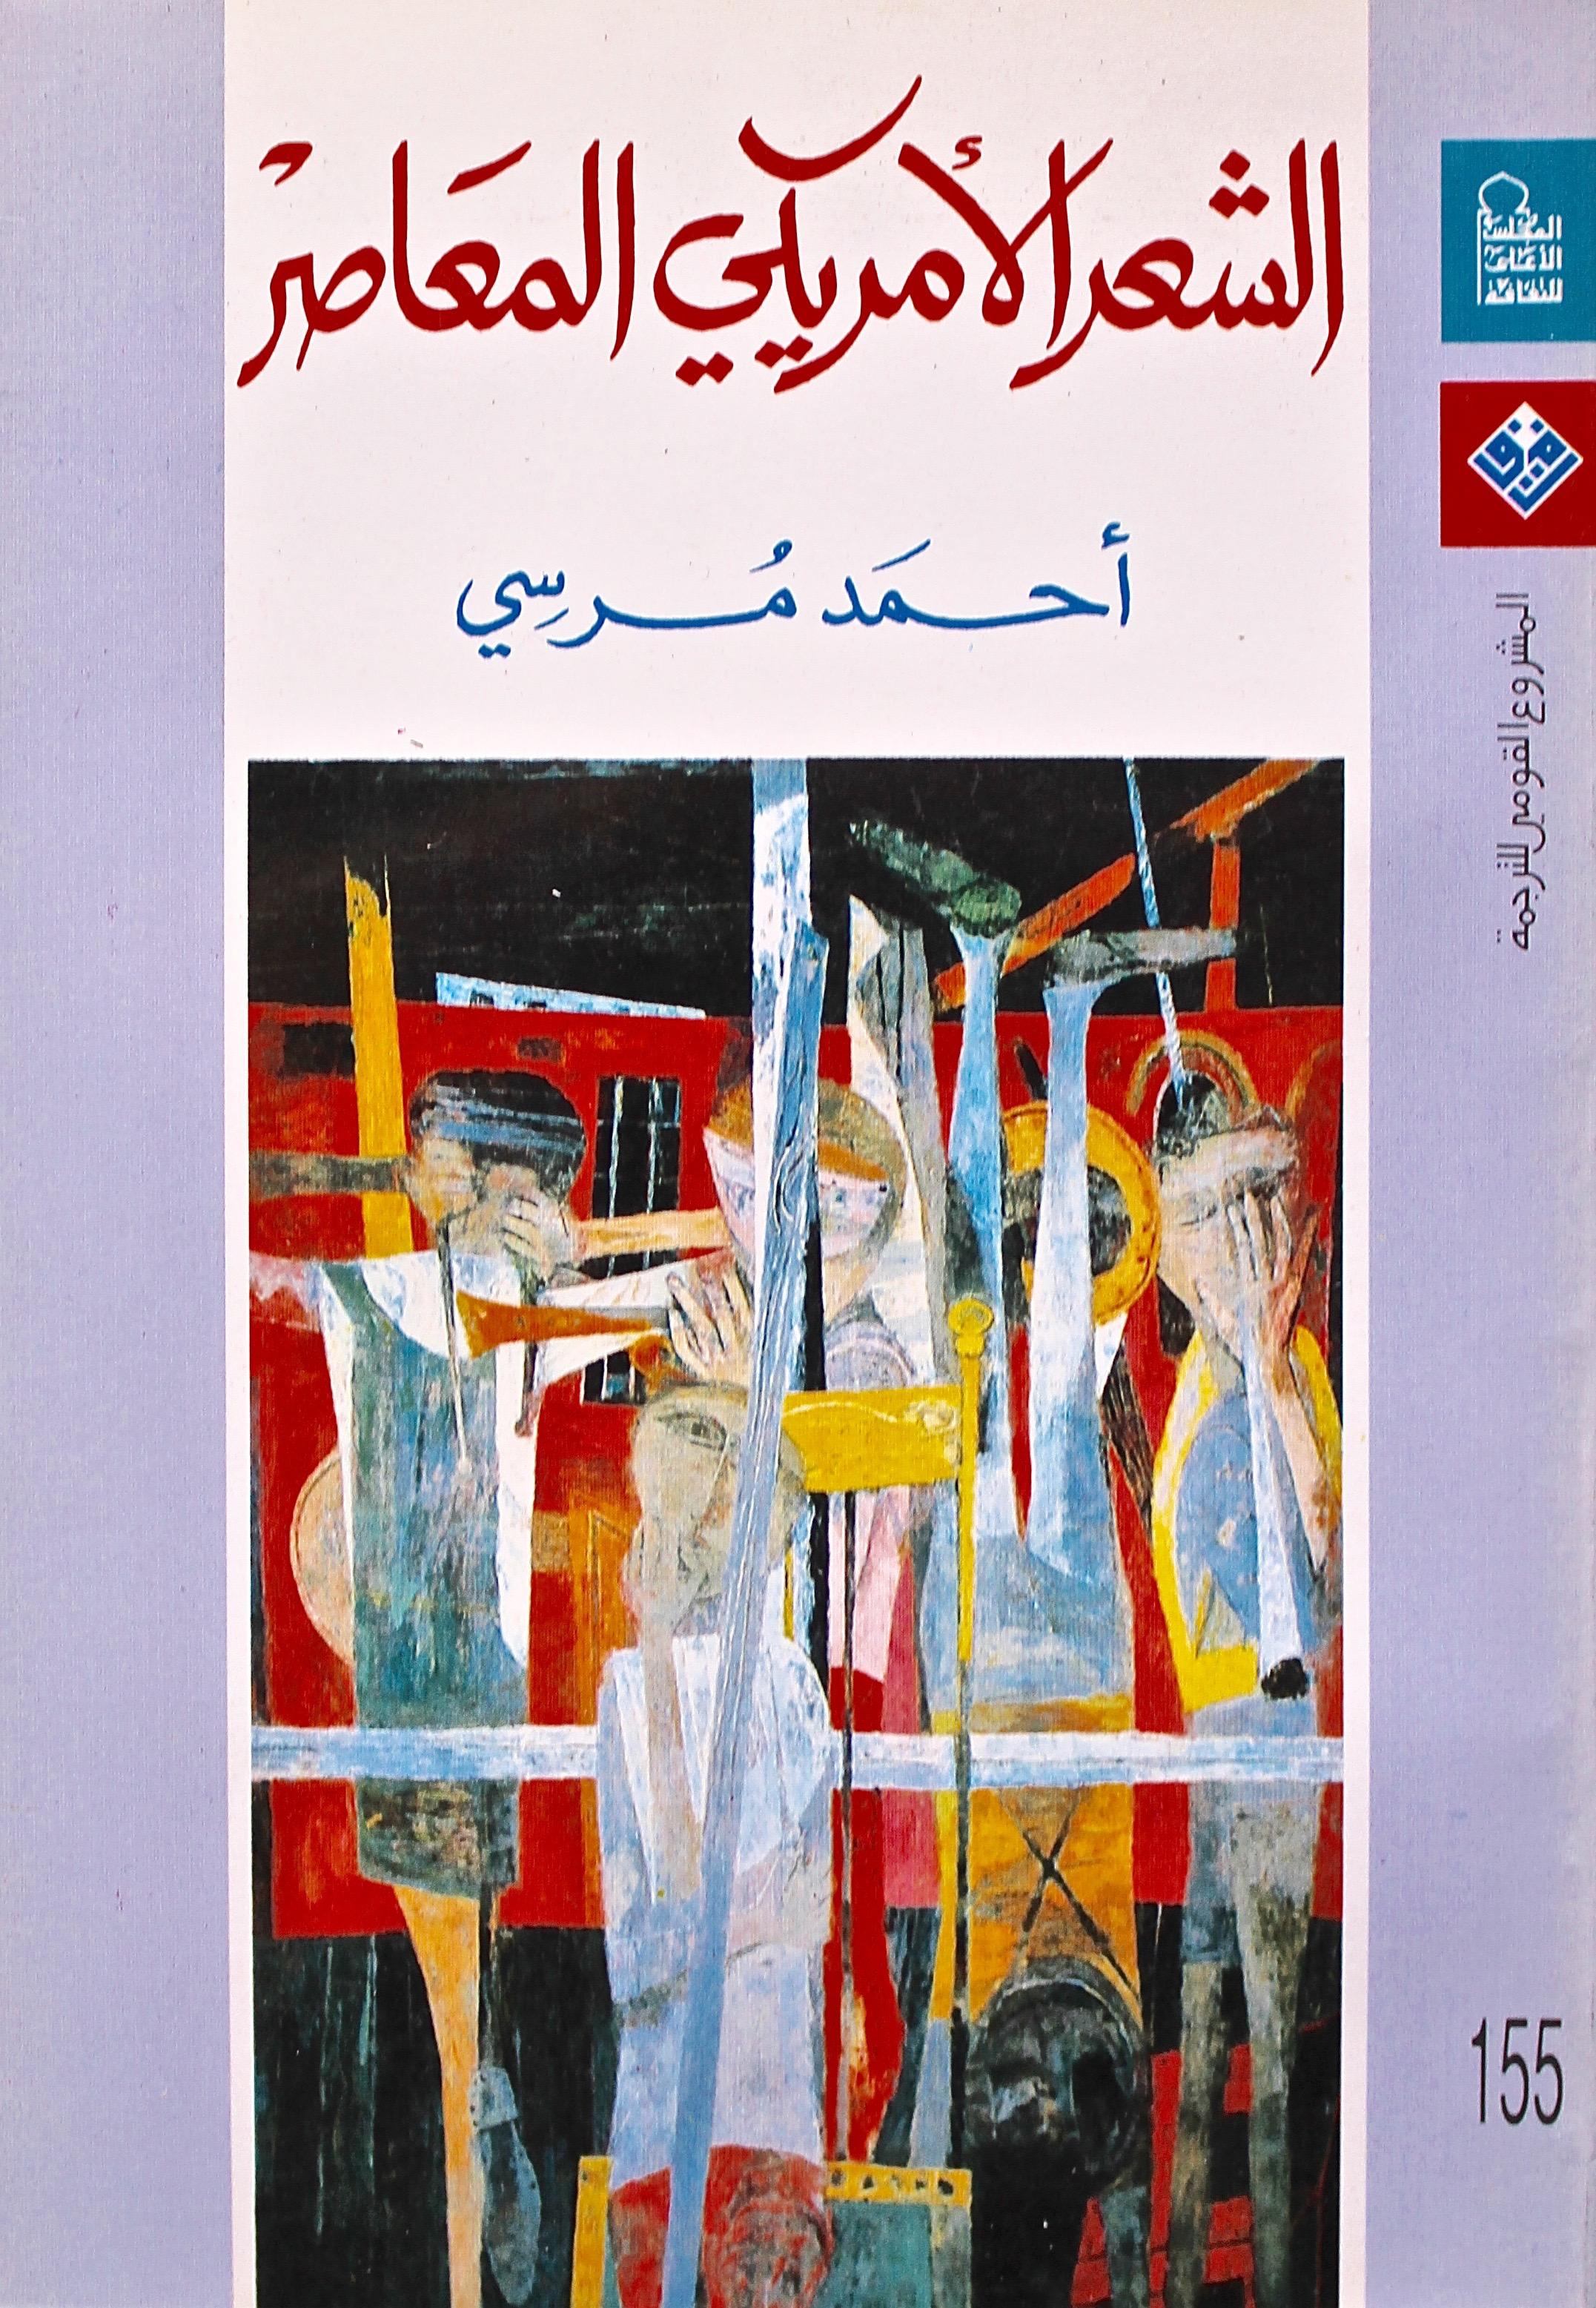 Ahmed_Morsi_Contemporary_American_Poetry.jpg